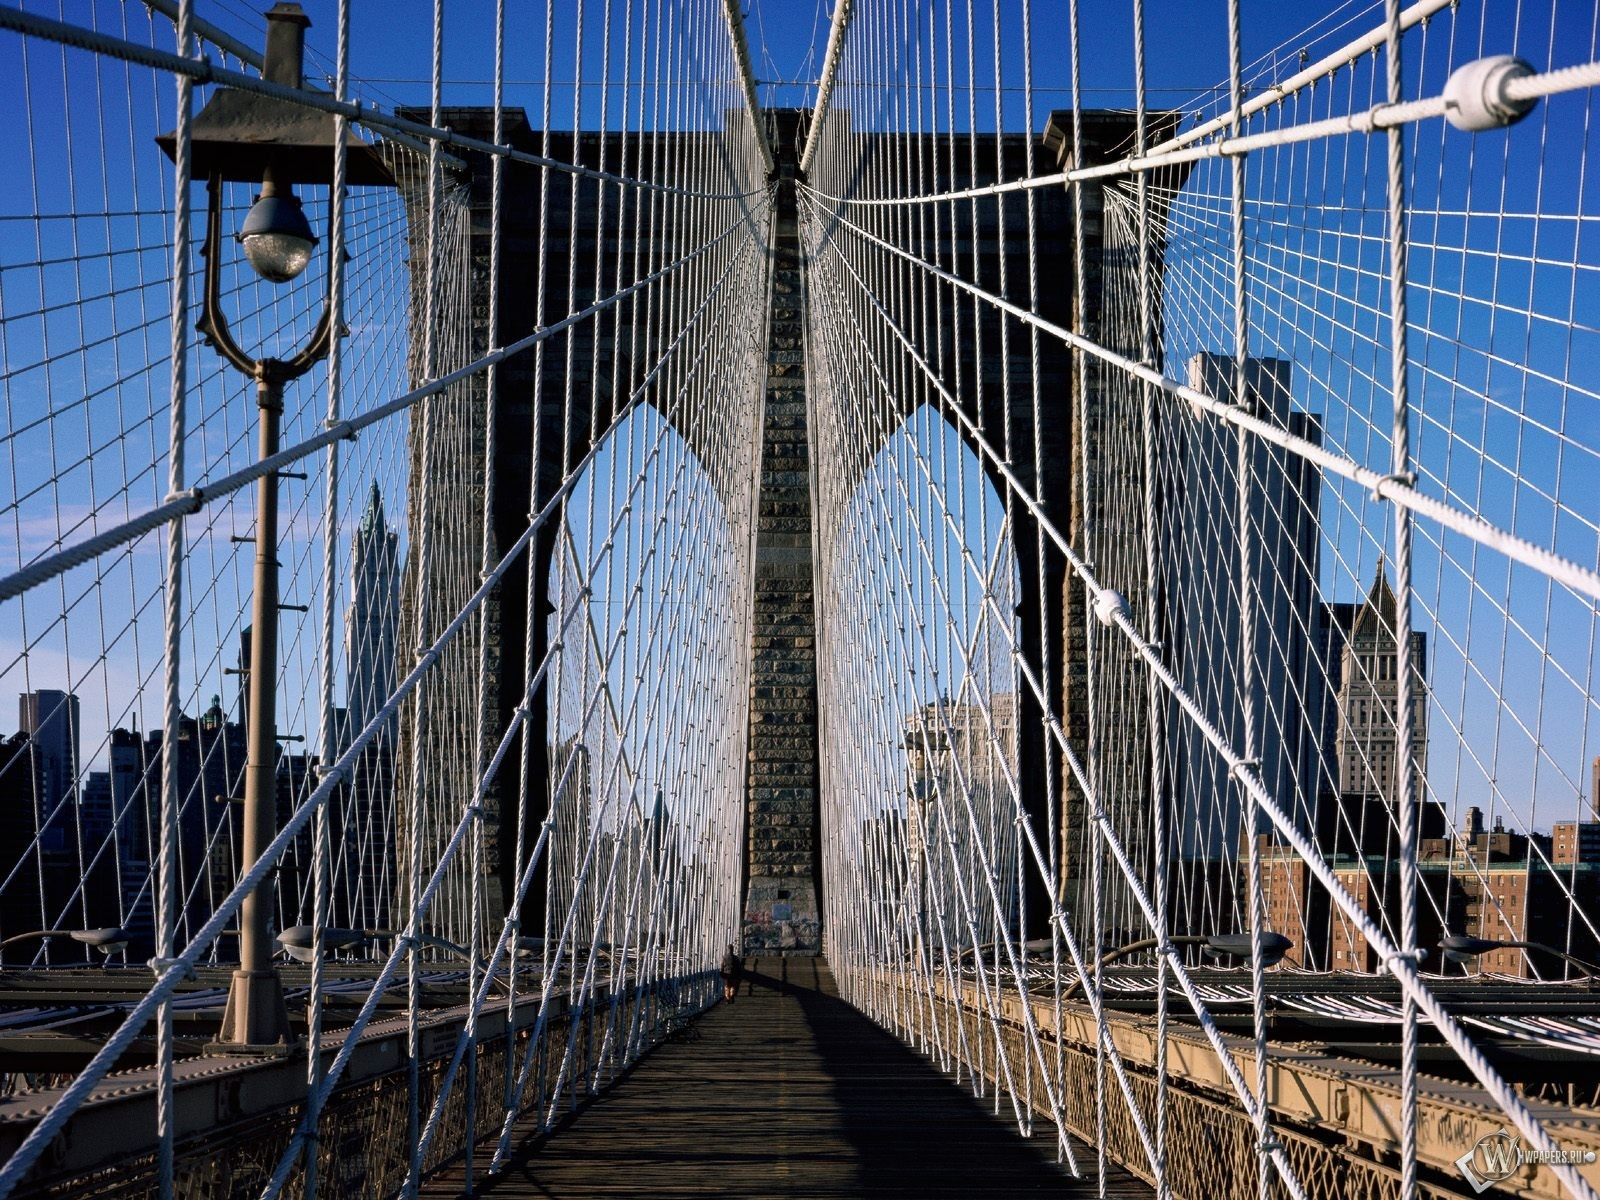 Brooklyn Bridge - New York 1600x1200